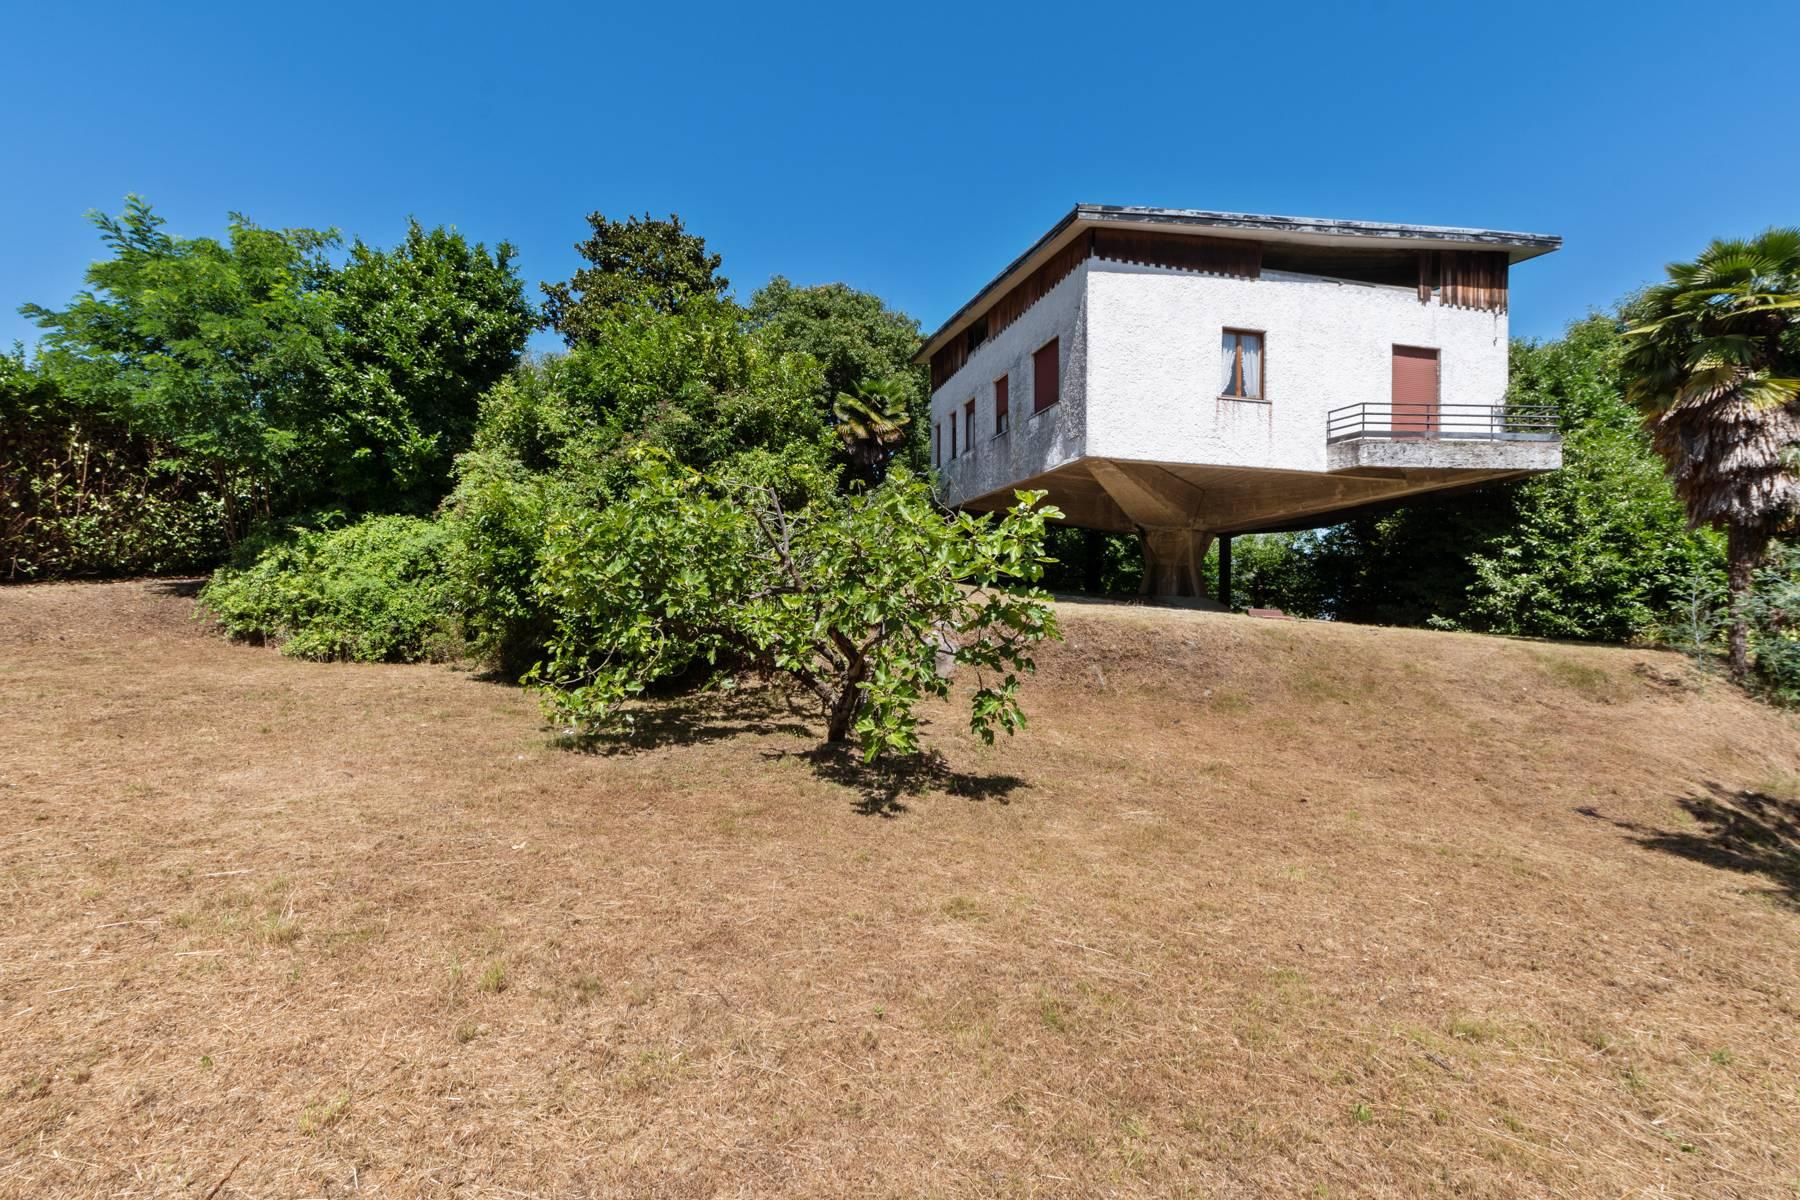 Villa in Vendita a Stresa: 5 locali, 150 mq - Foto 4